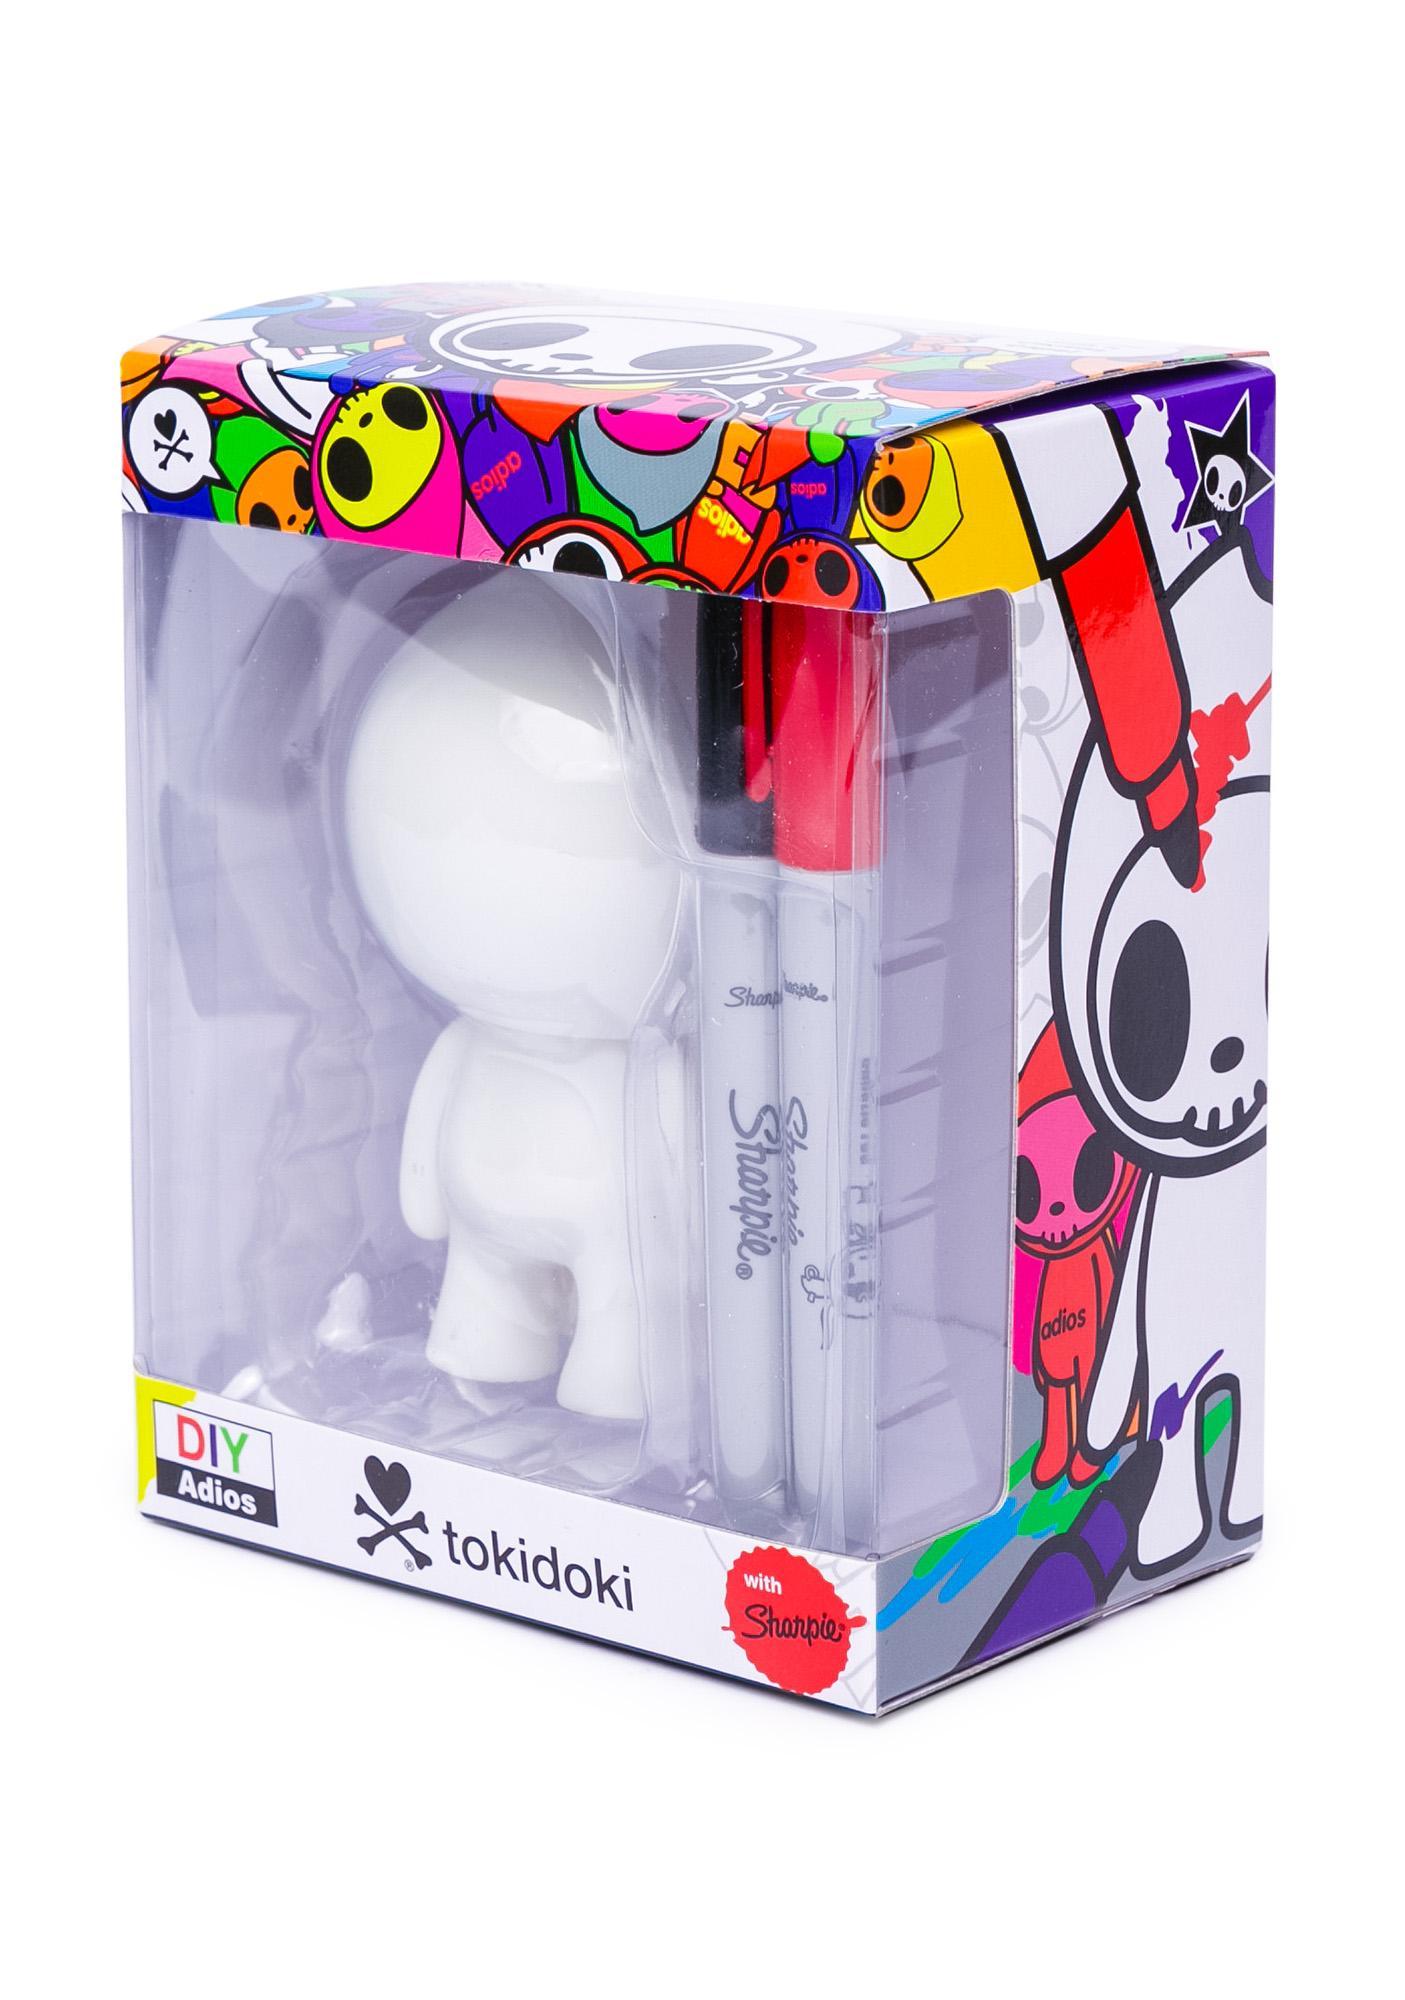 Tokidoki DIY Adios Vinyl Toy